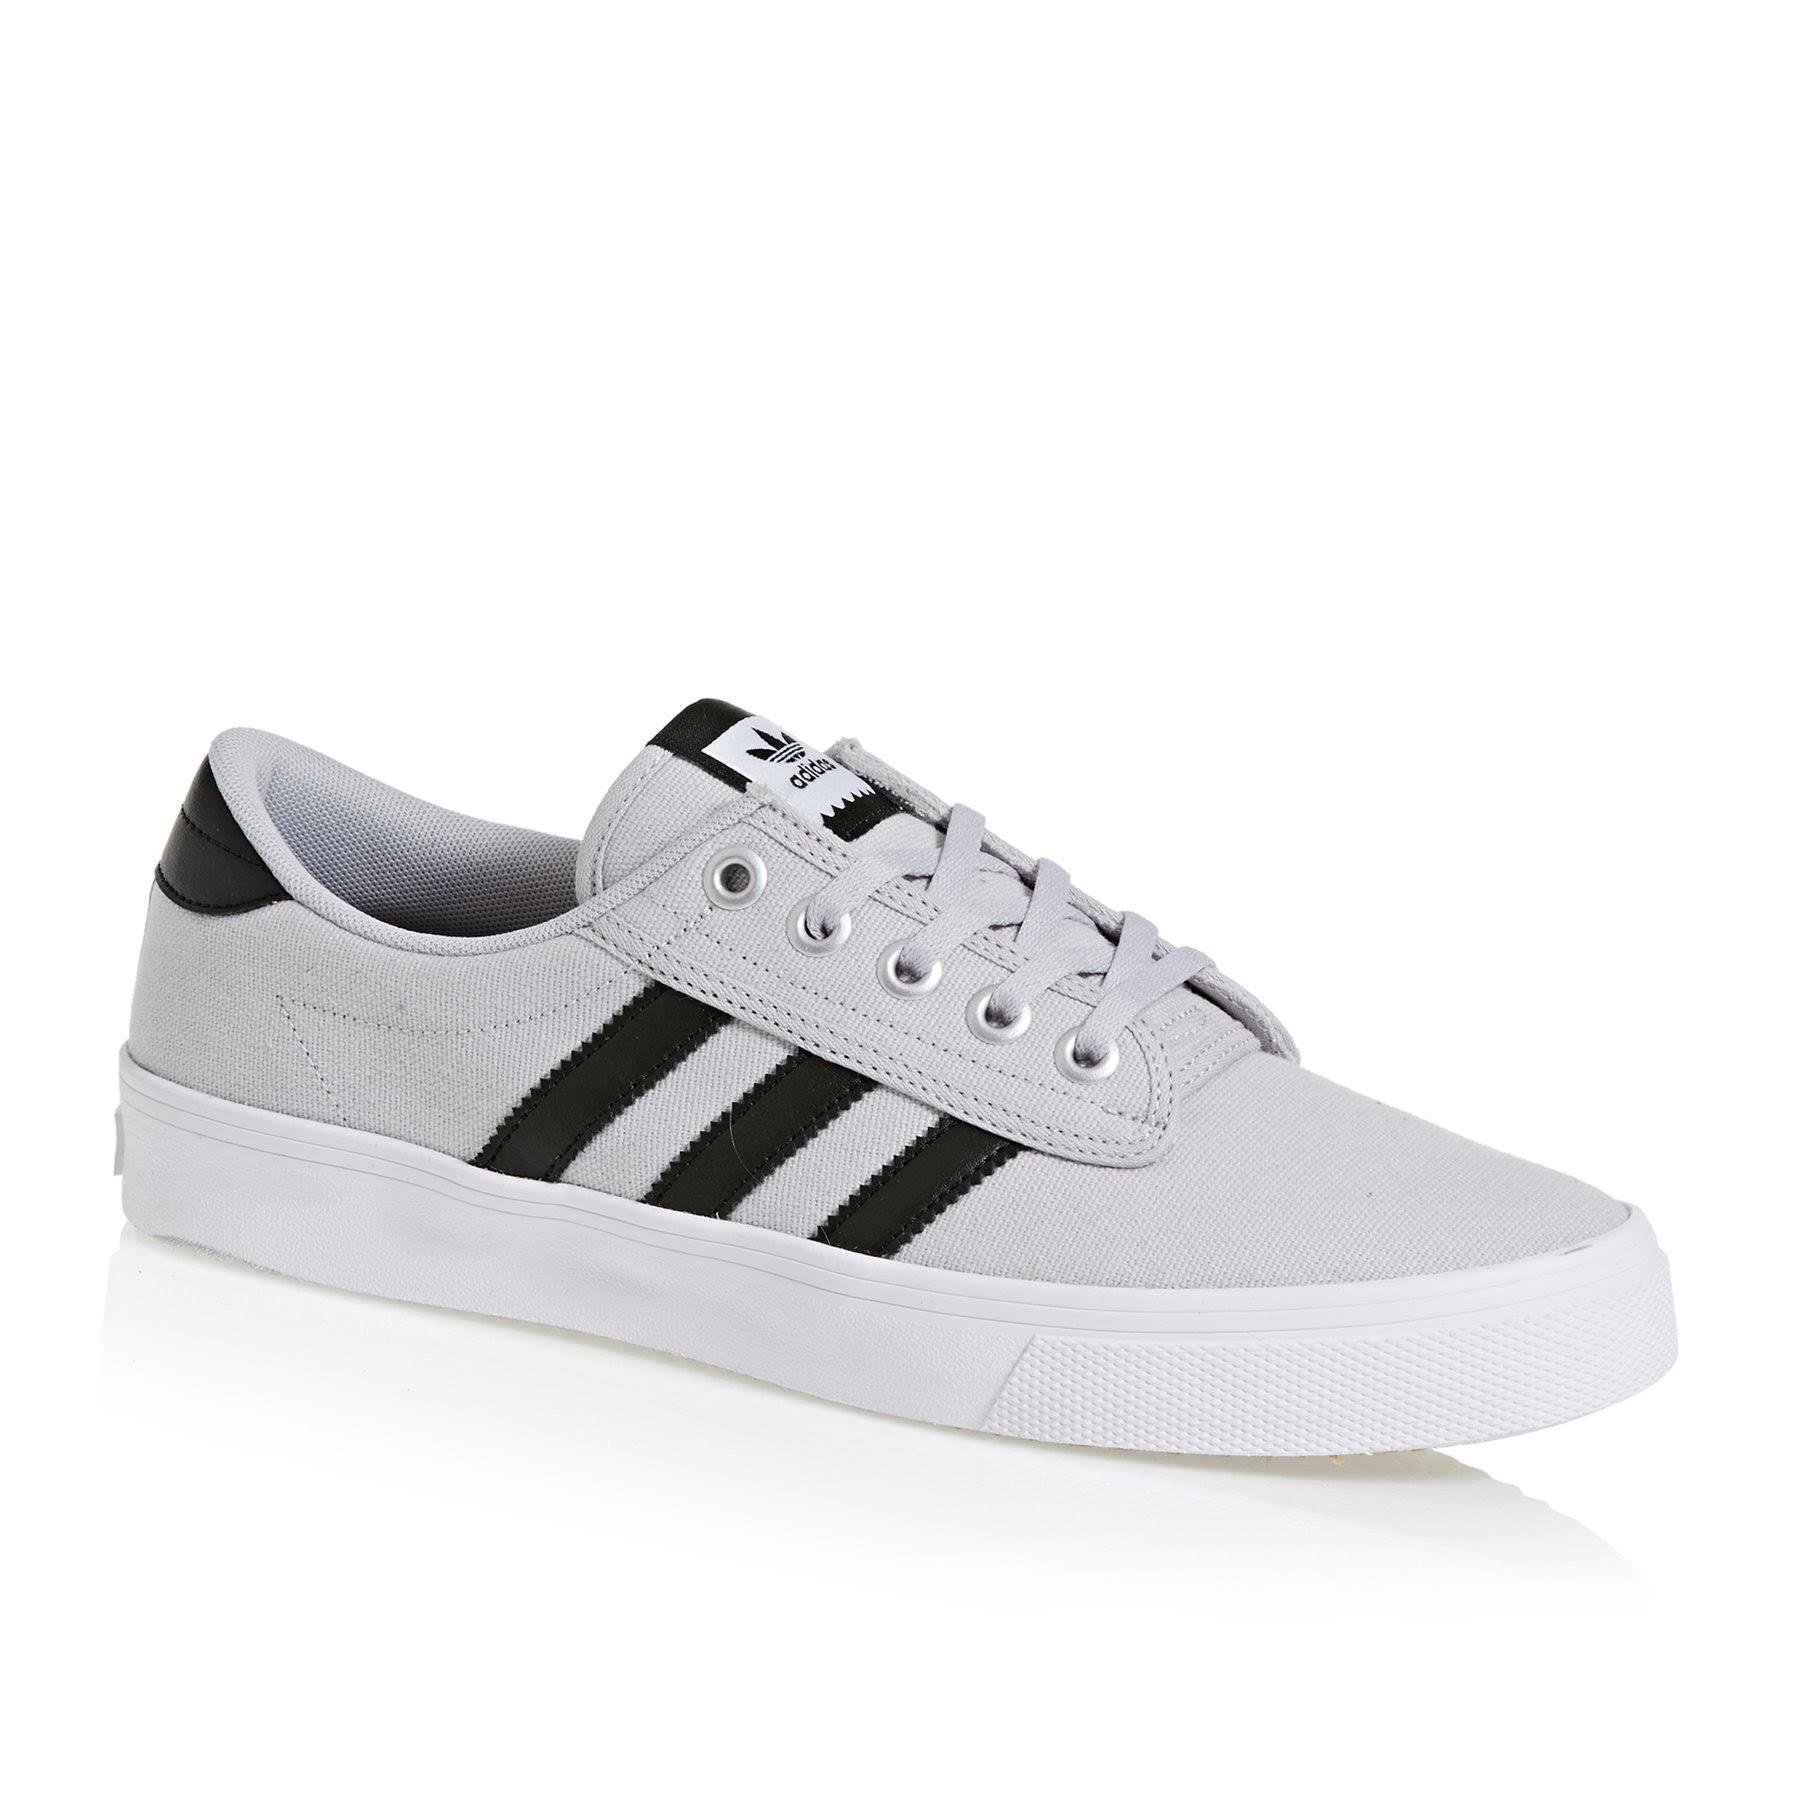 Ftw White Grey Kiel Adidas Black Shoes Skate Solid FAIwqX